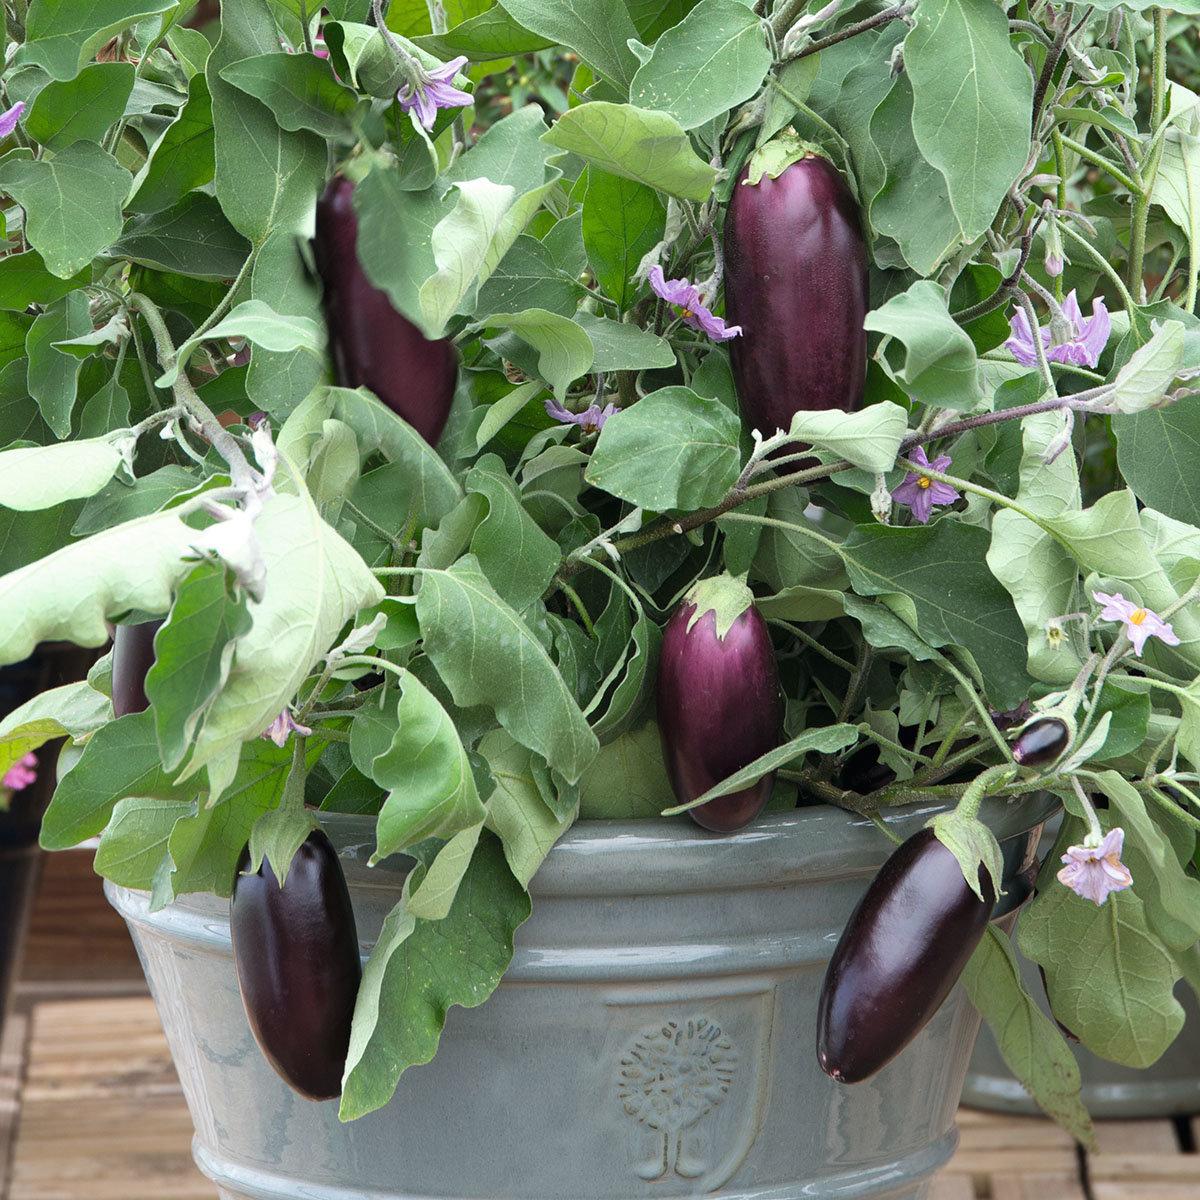 Mini-Auberginenpflanze Diamond Purple, veredelt, im ca. 13 cm-Topf   #3